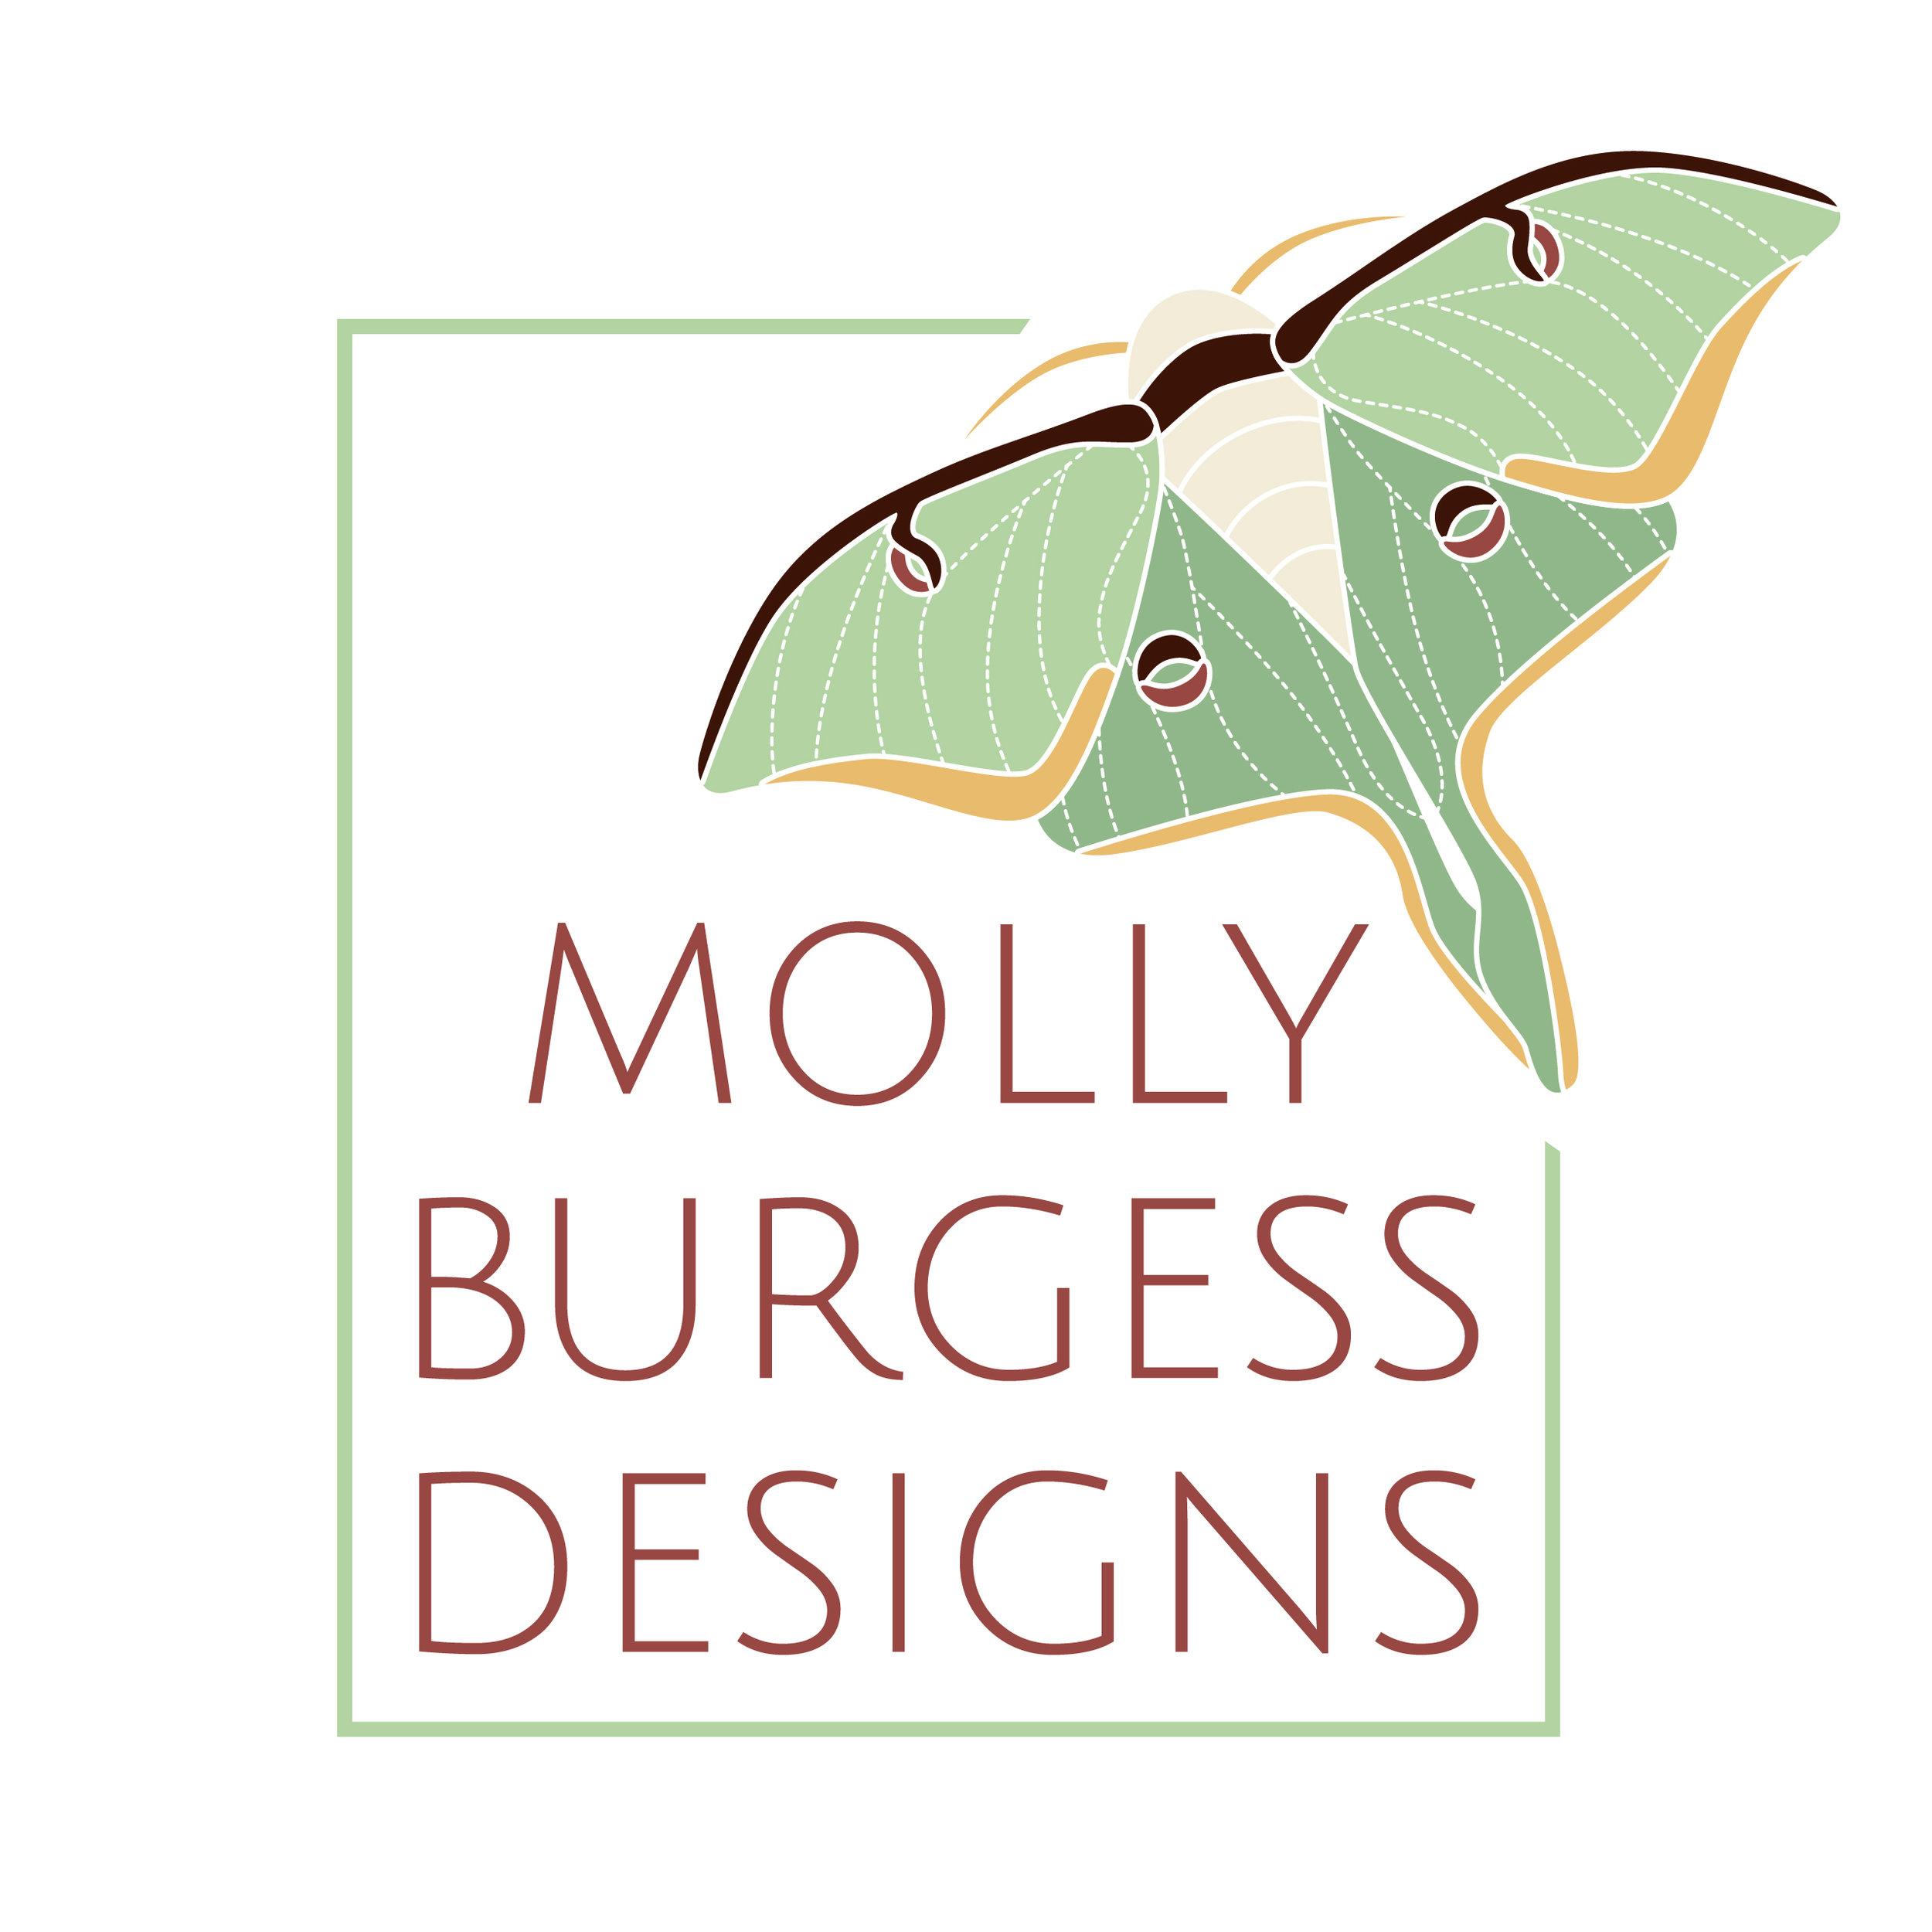 Molly Burgess Designs LOGO.jpg